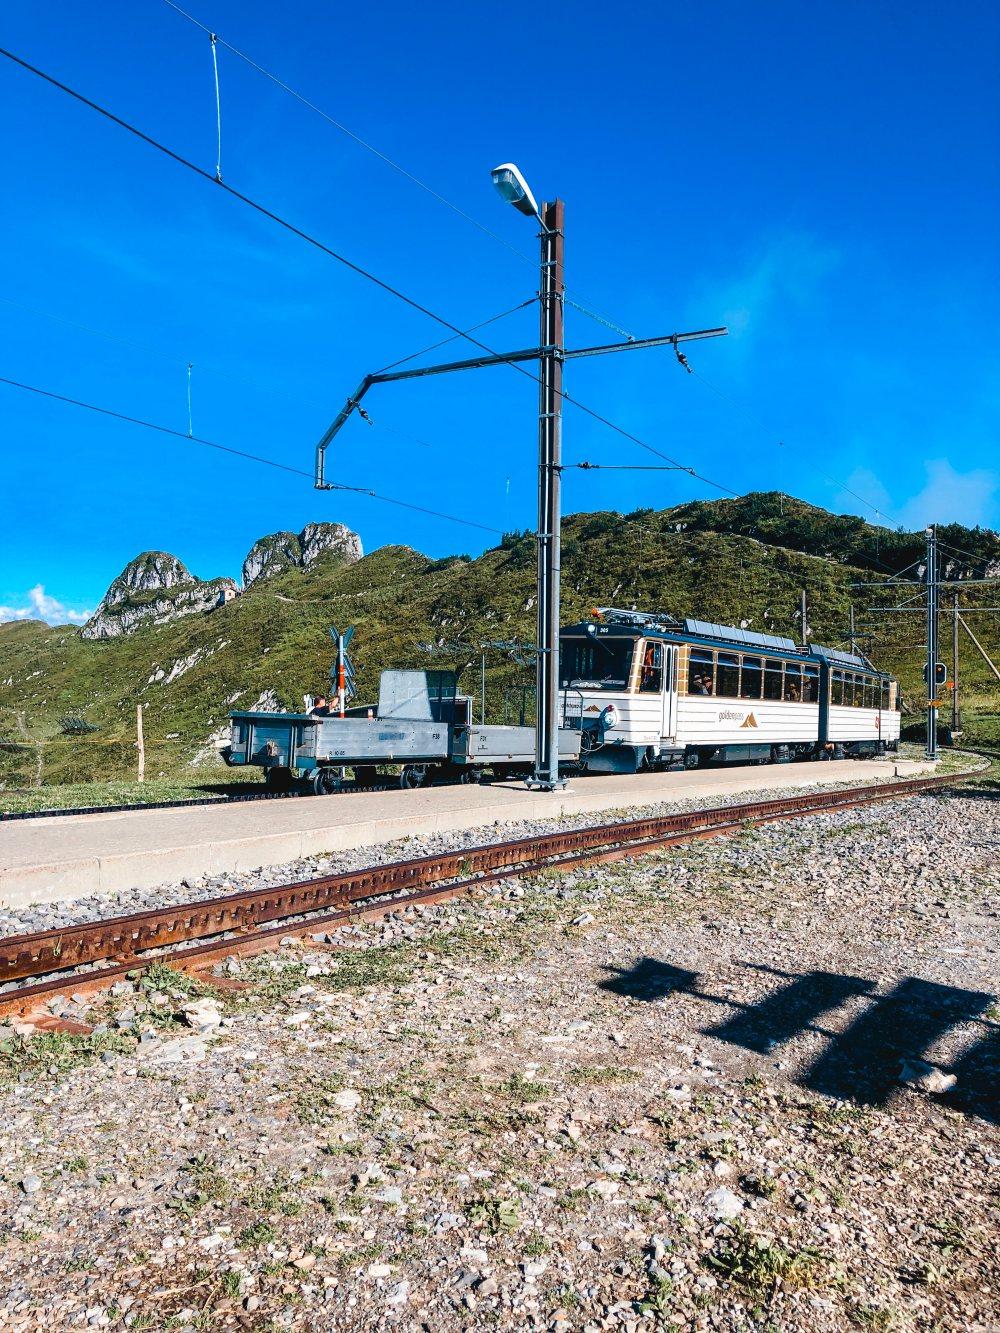 rochers-de-naye-montreux-train